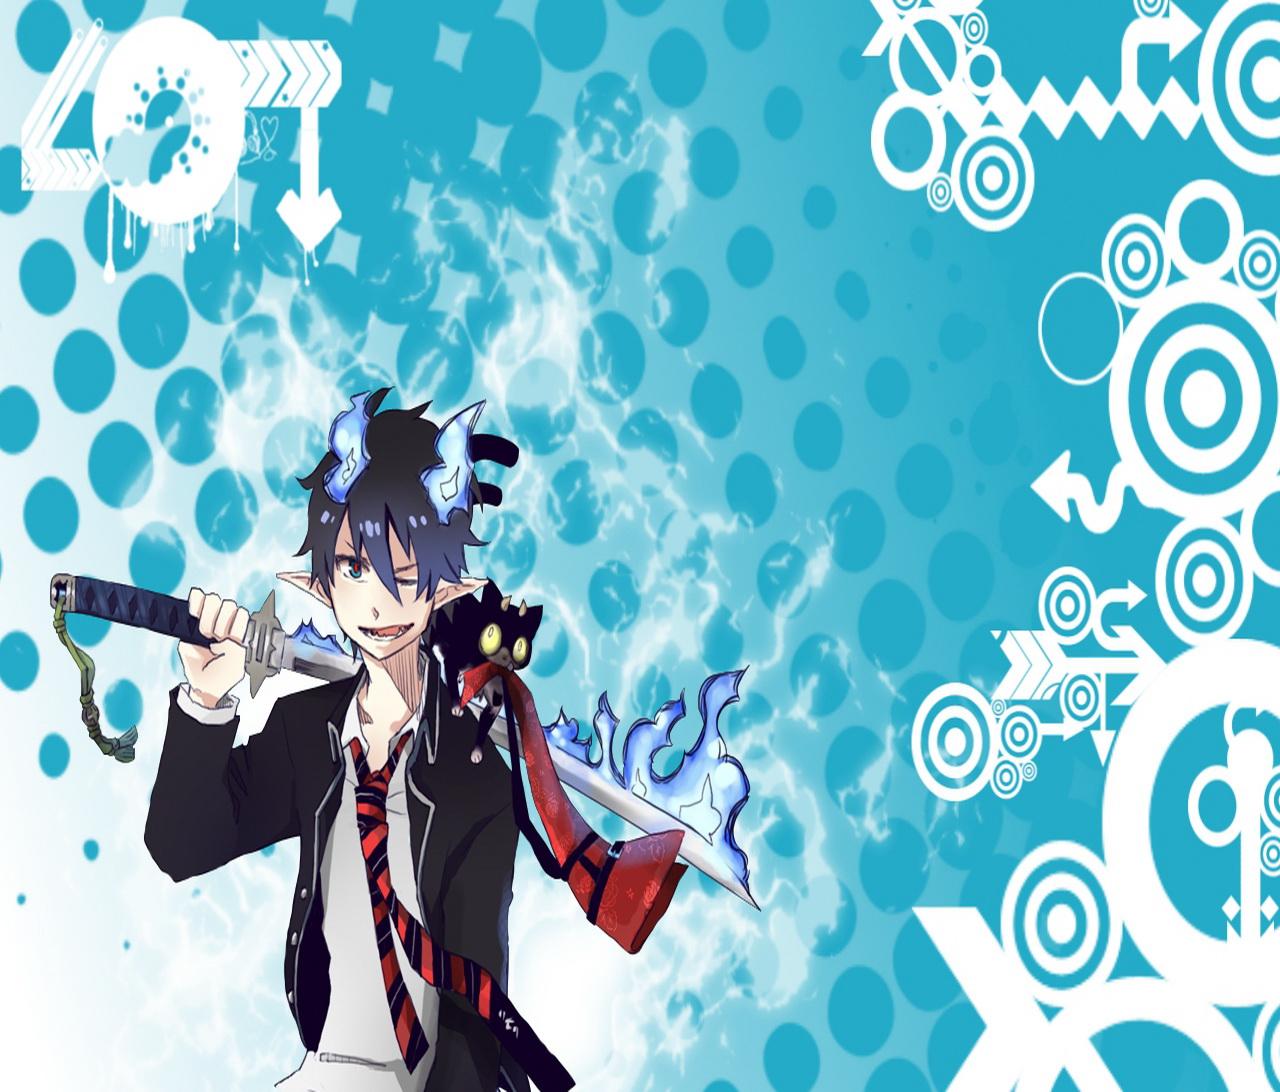 Photo Ao No Exorcist Anime